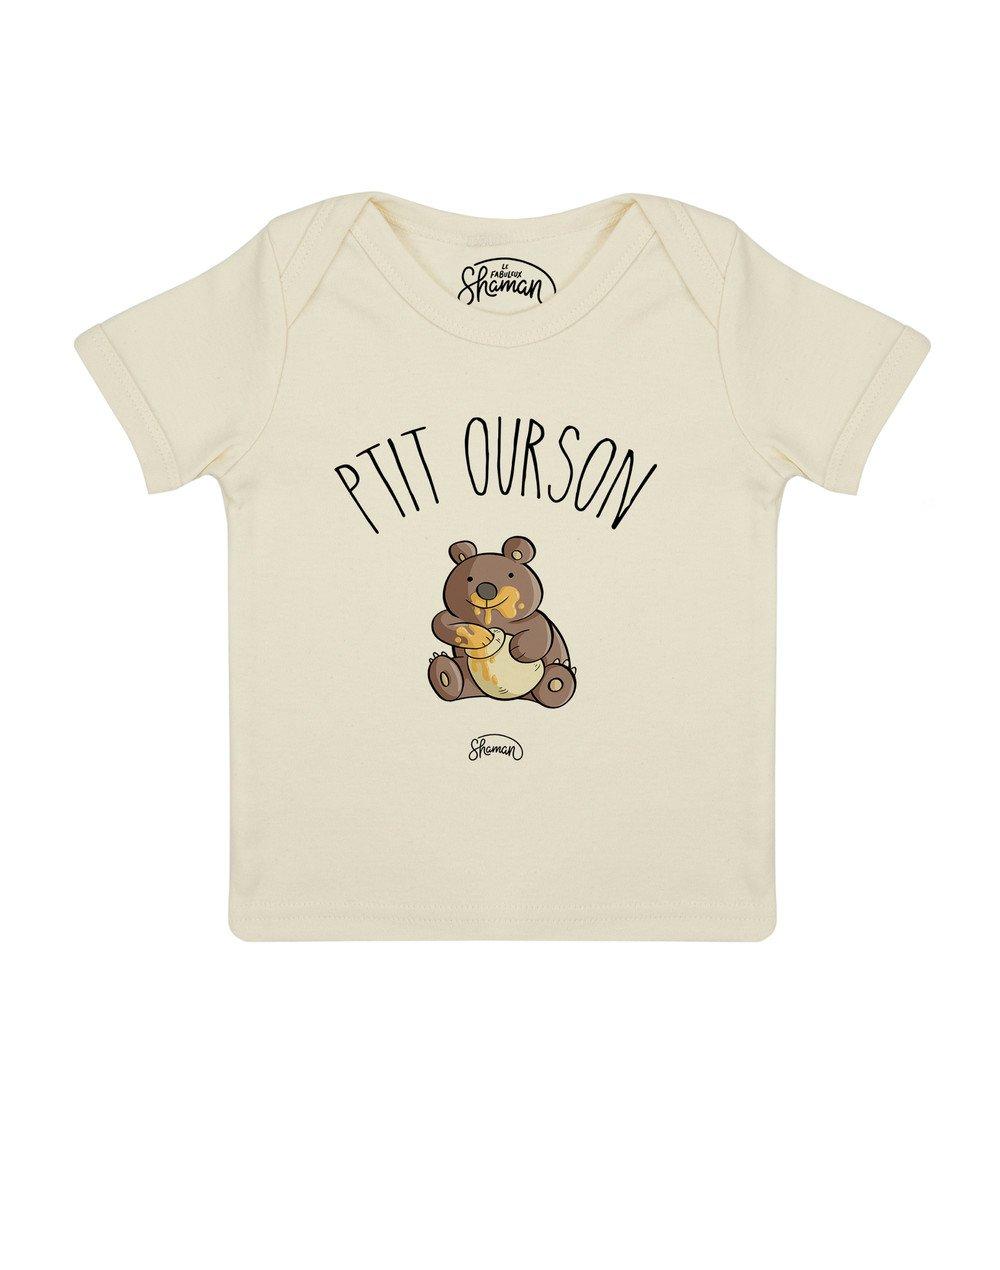 Tee shirt Ptit ourson